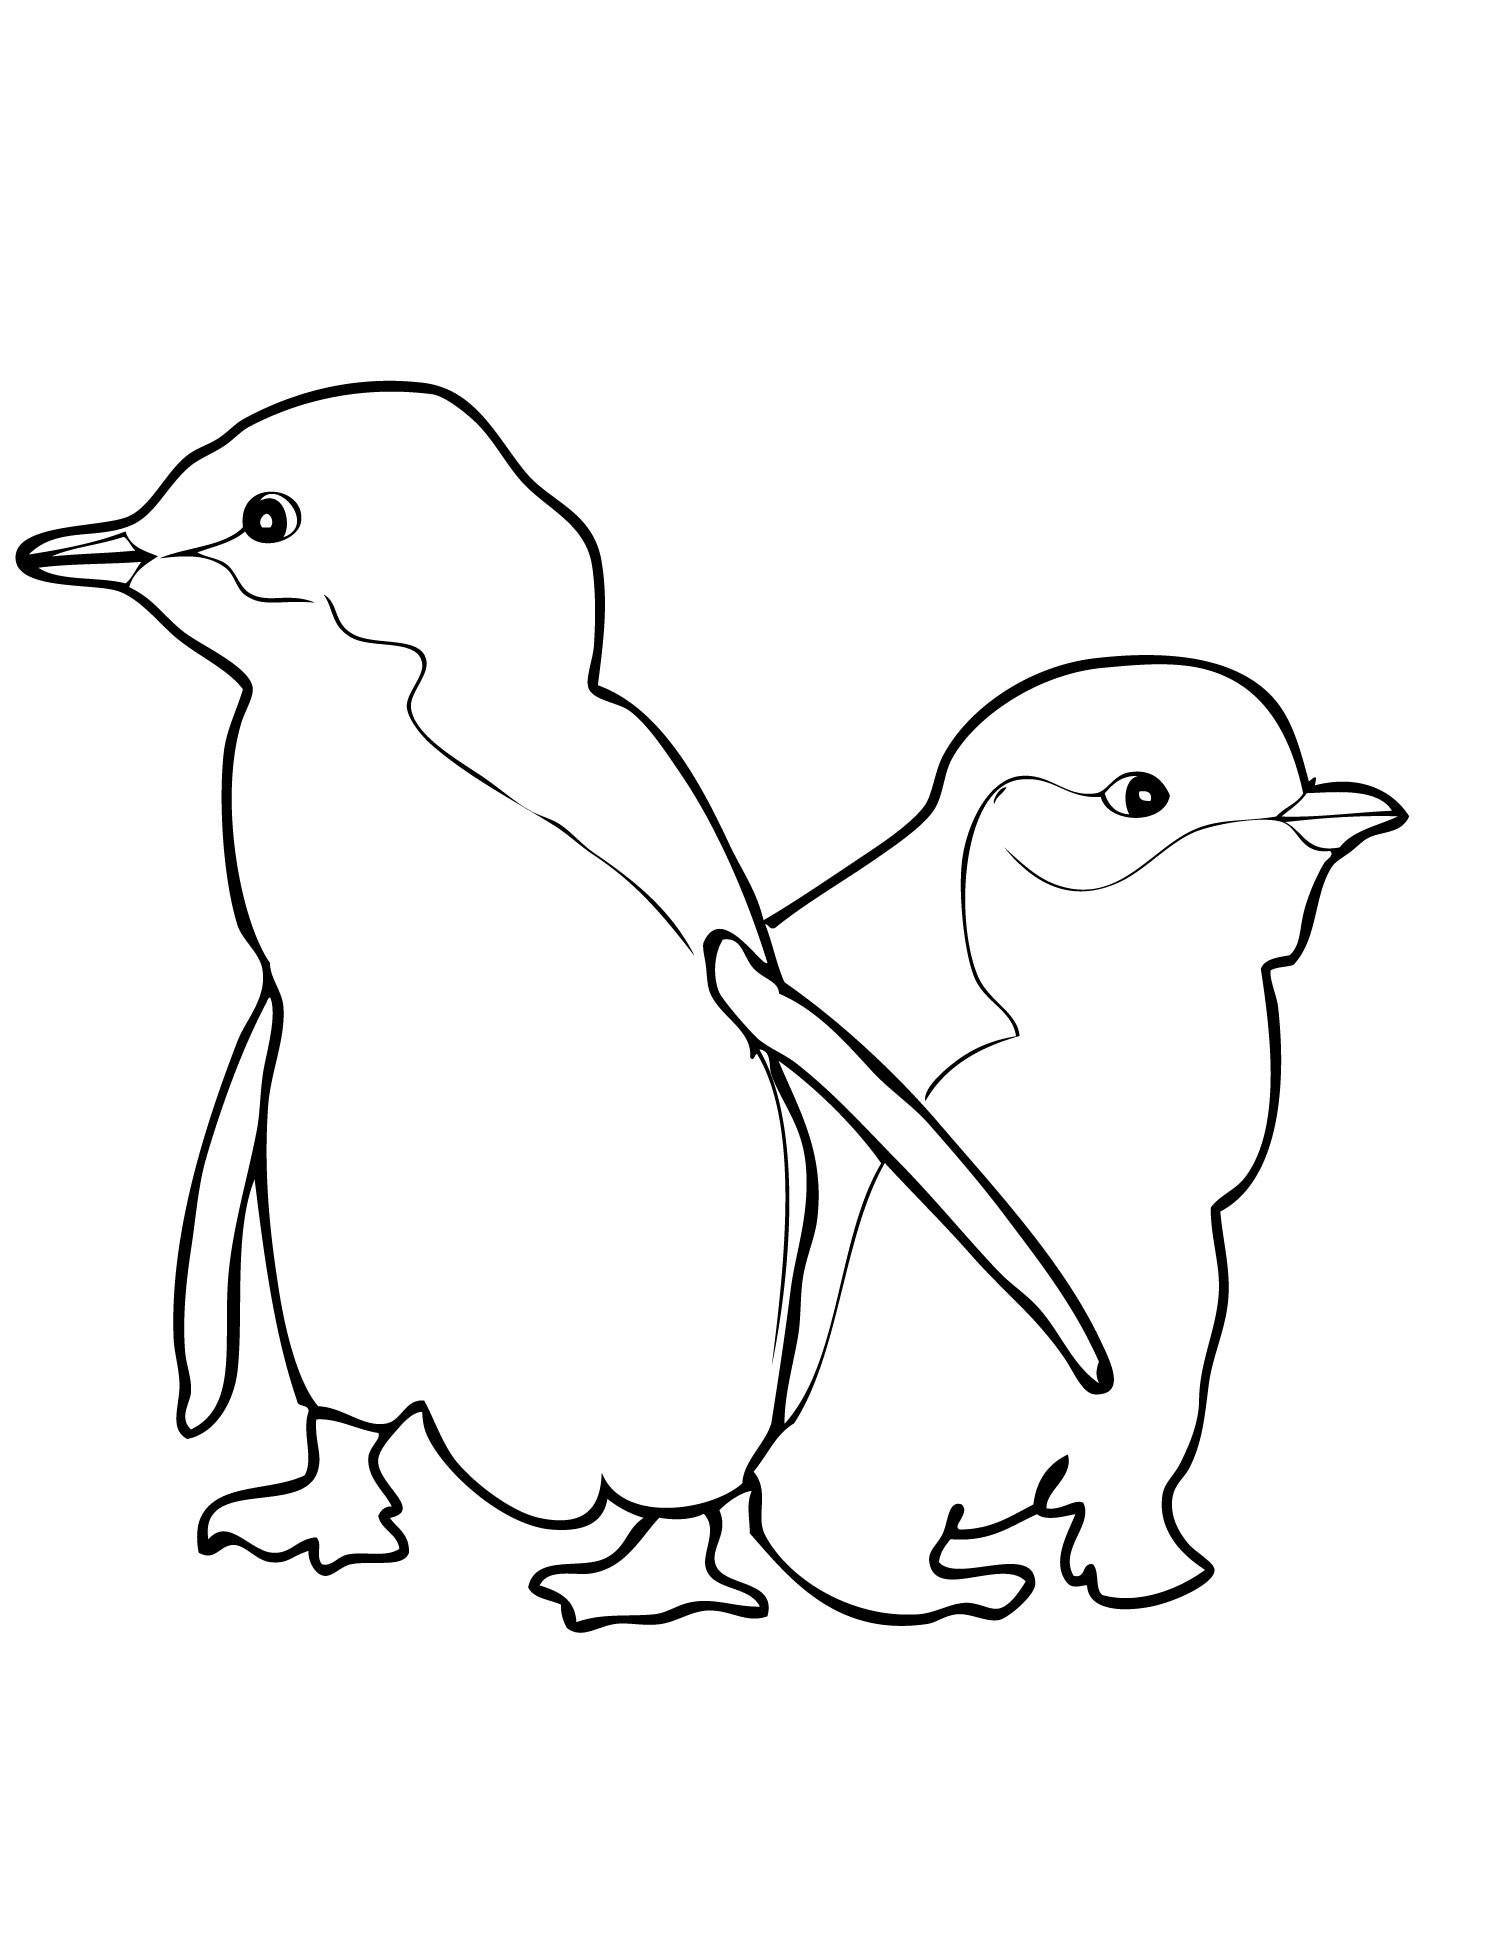 Cute penguins coloring pages